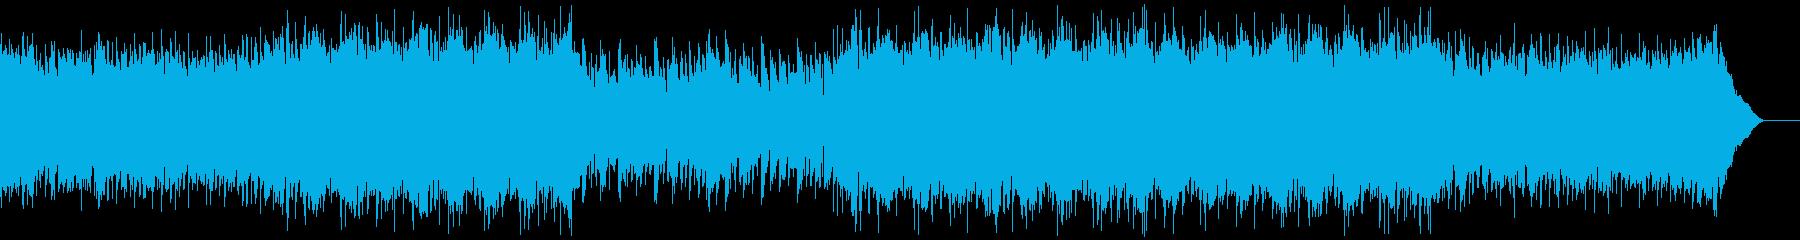 Youtube・爽やかな夏の海・ポップの再生済みの波形